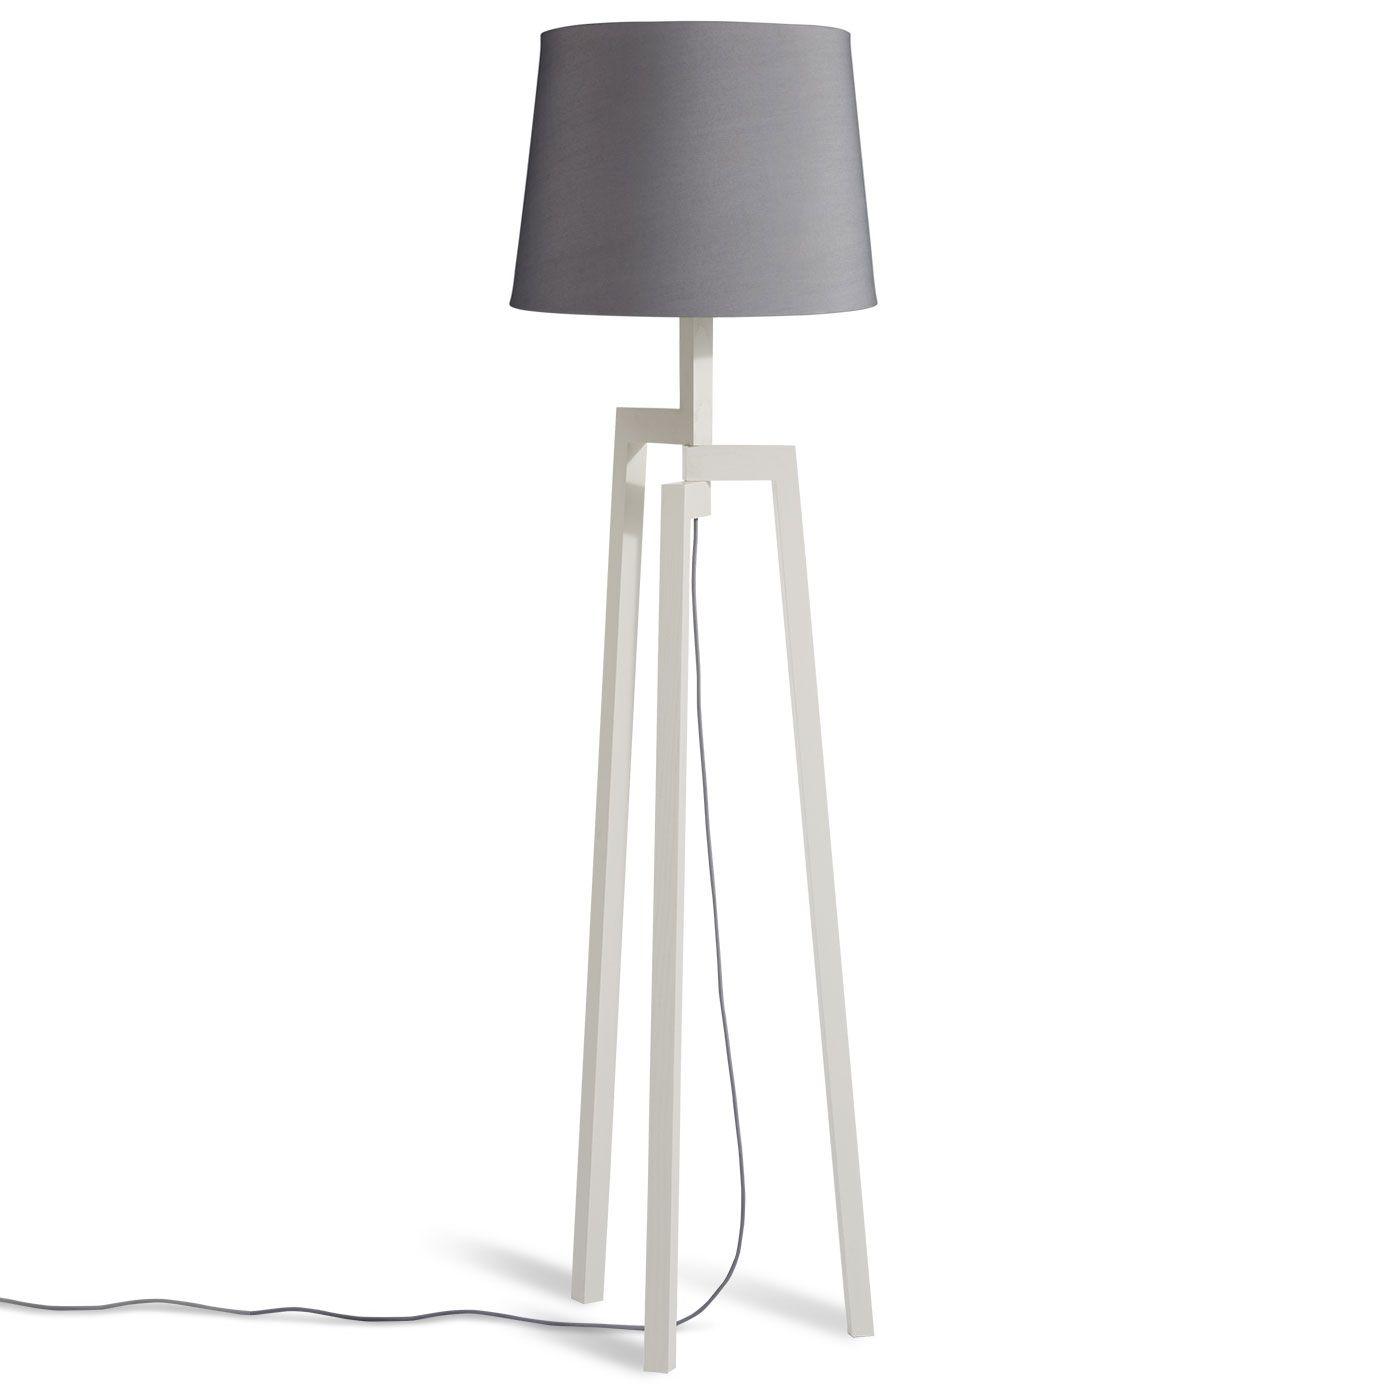 pier xplrvr modern lamp contemporary imports portfolio lamps and floor